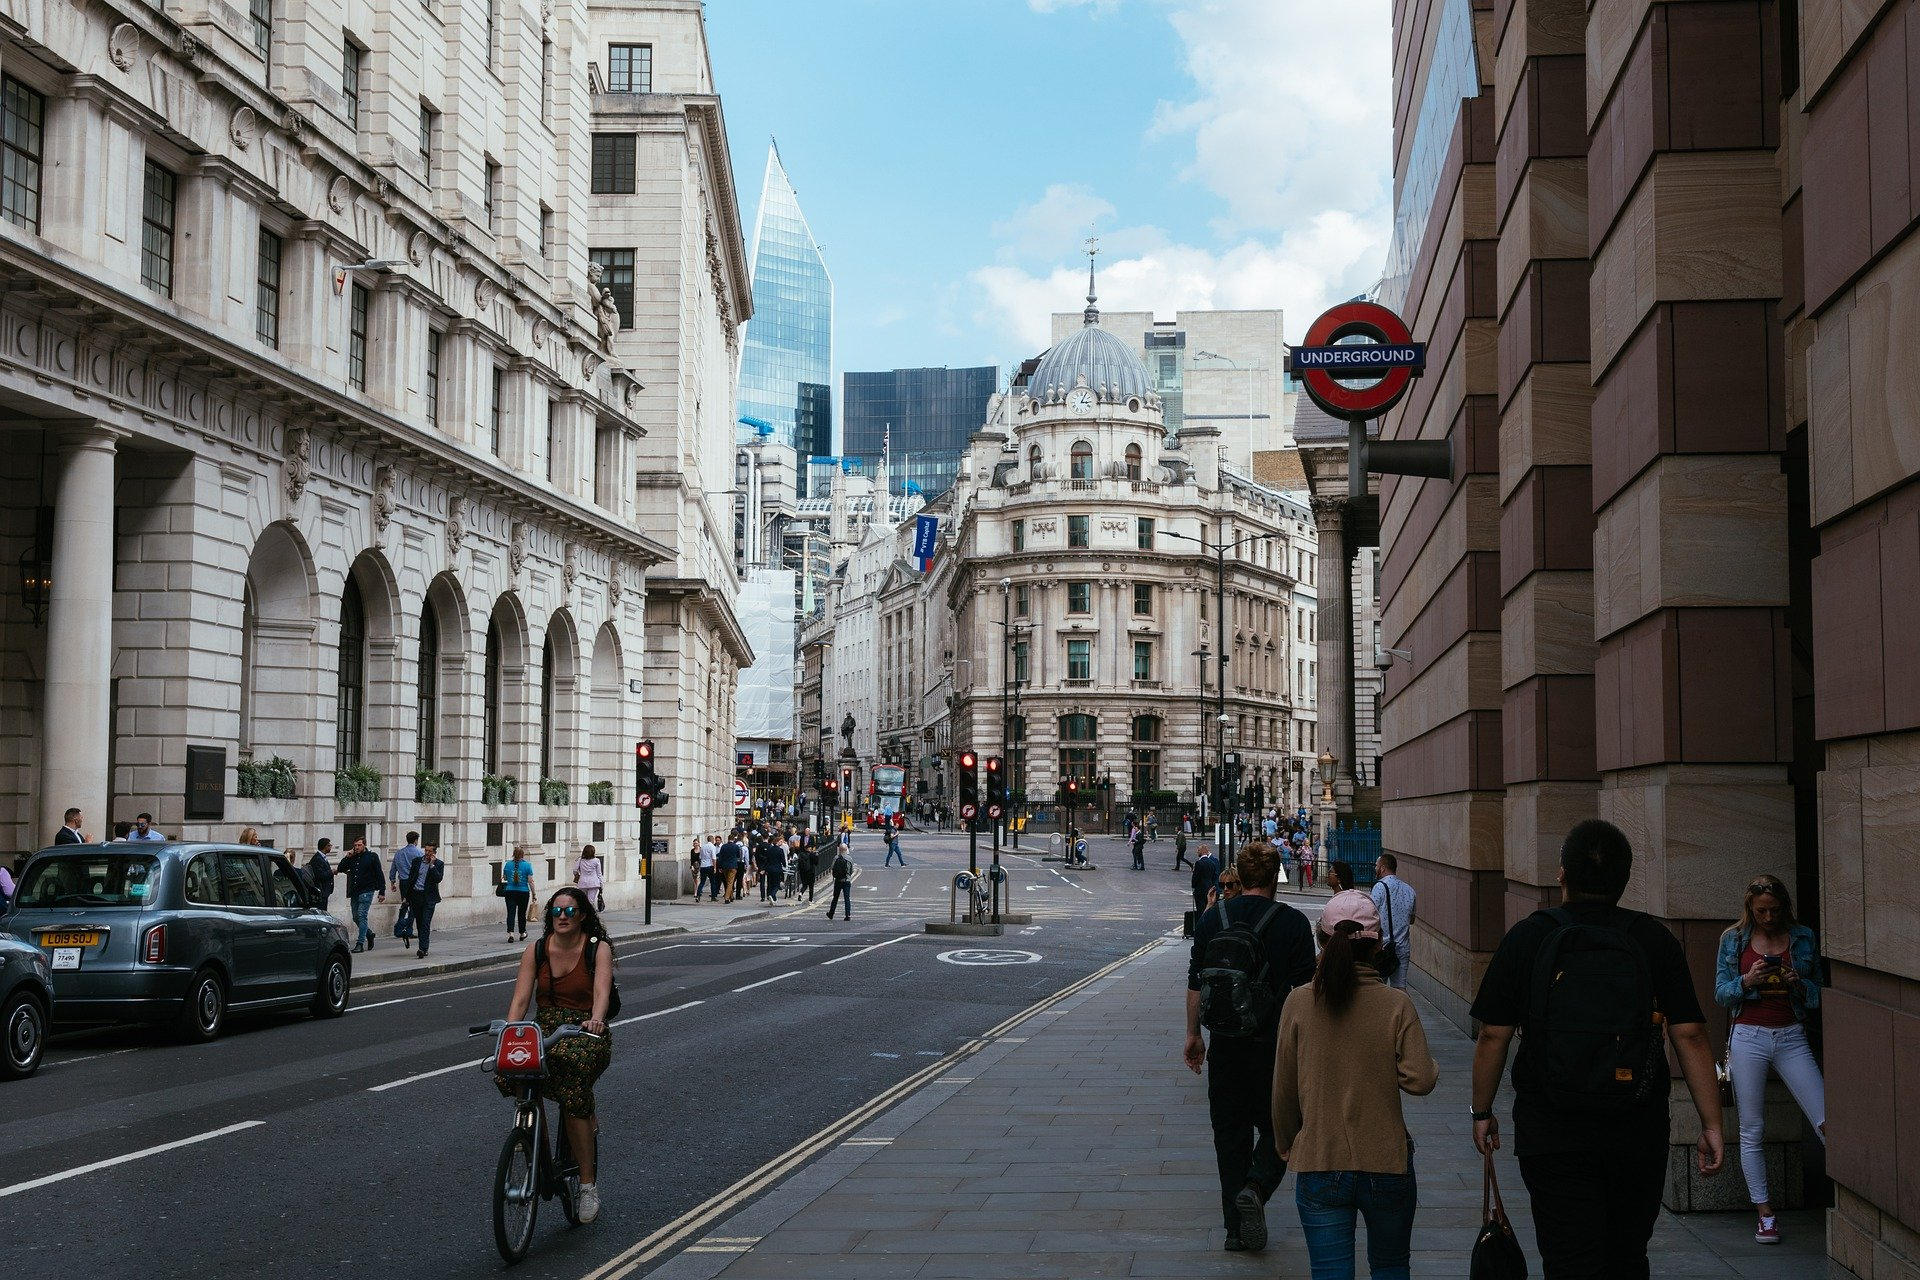 city-of-london-4481399_1920